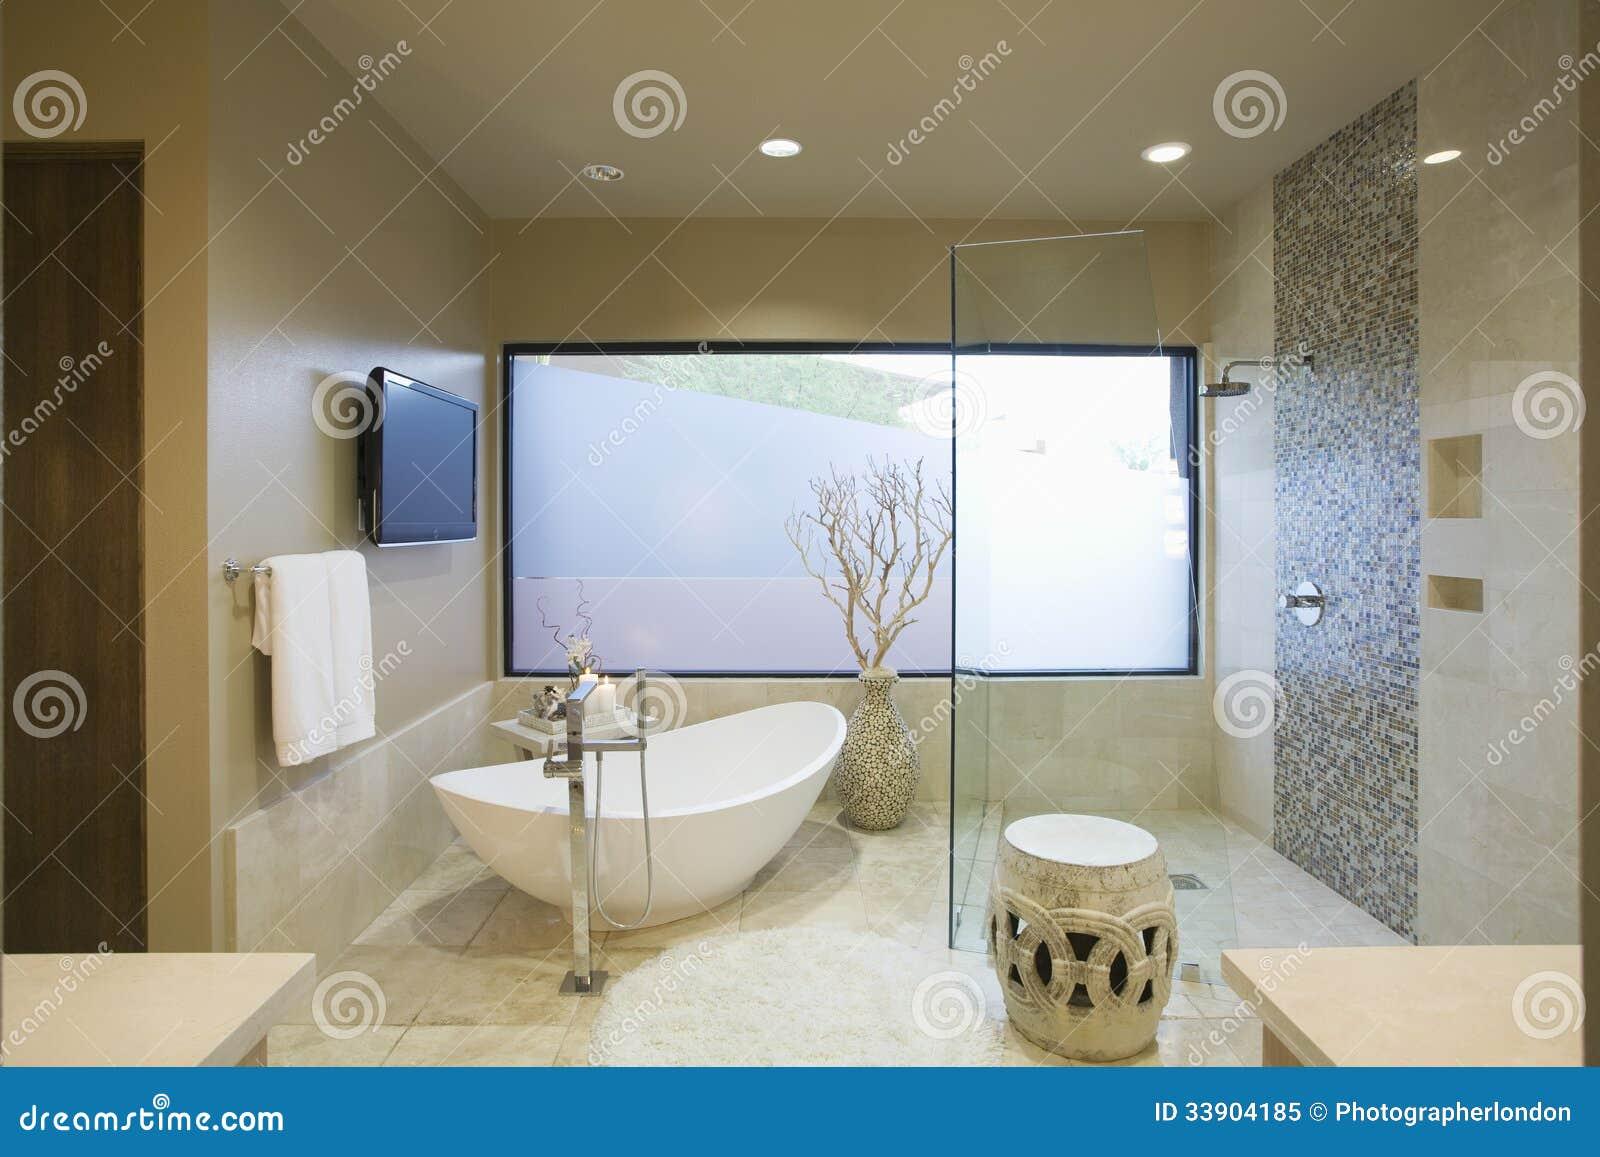 Modern bathroom with freestanding bath royalty free stock photo image 33904185 - Image of bath room ...